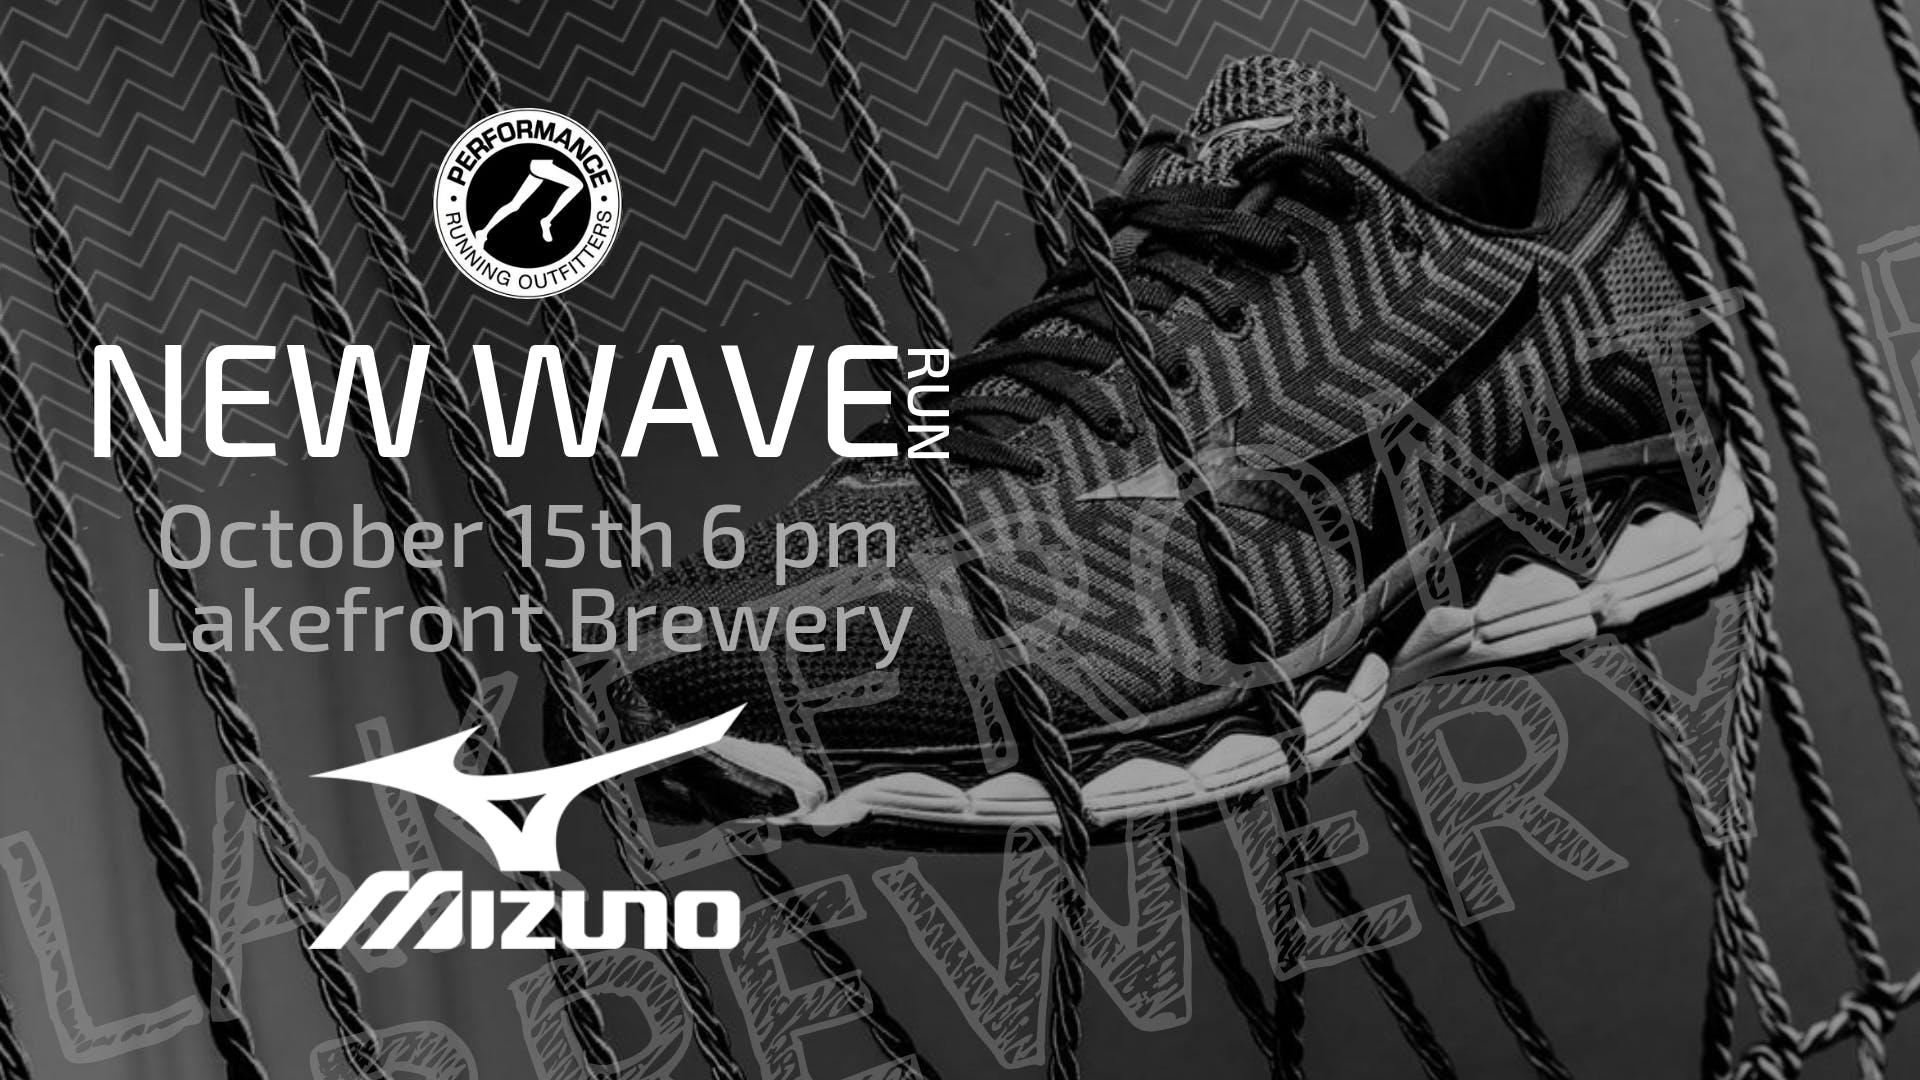 New Wave Brewery Run with Mizuno - 10/15